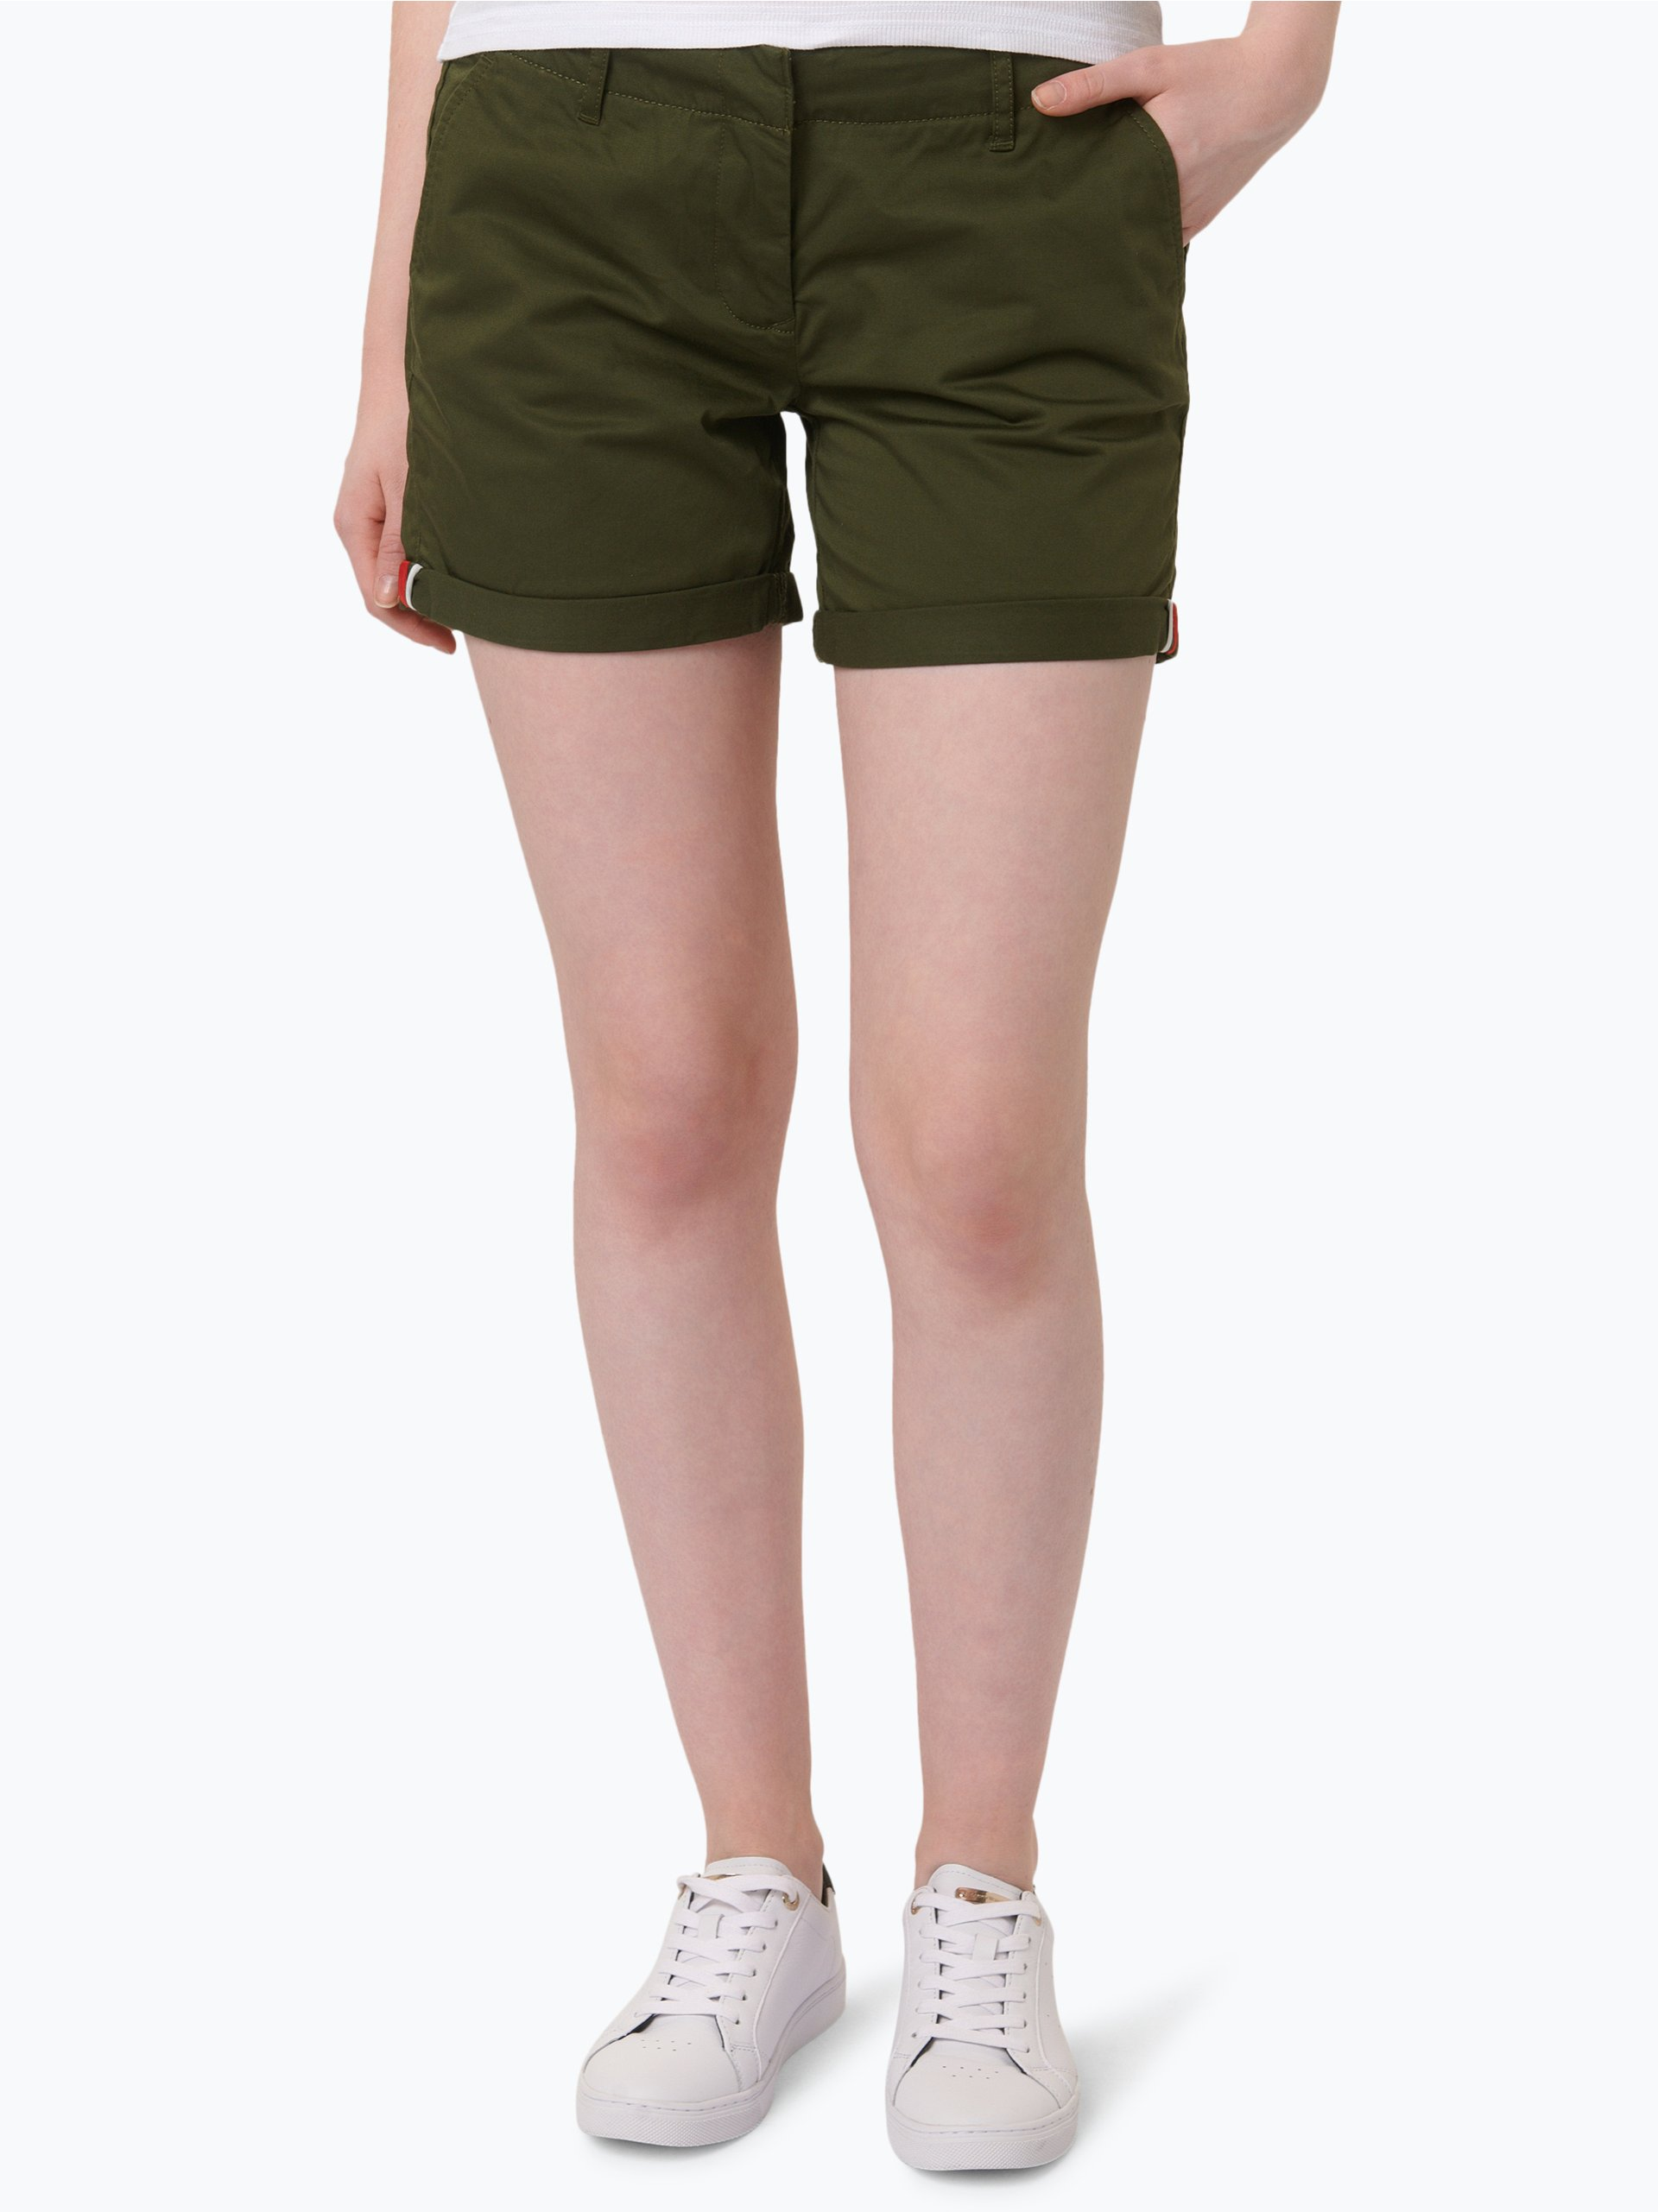 tommy jeans damen shorts oliv uni online kaufen peek und cloppenburg de. Black Bedroom Furniture Sets. Home Design Ideas